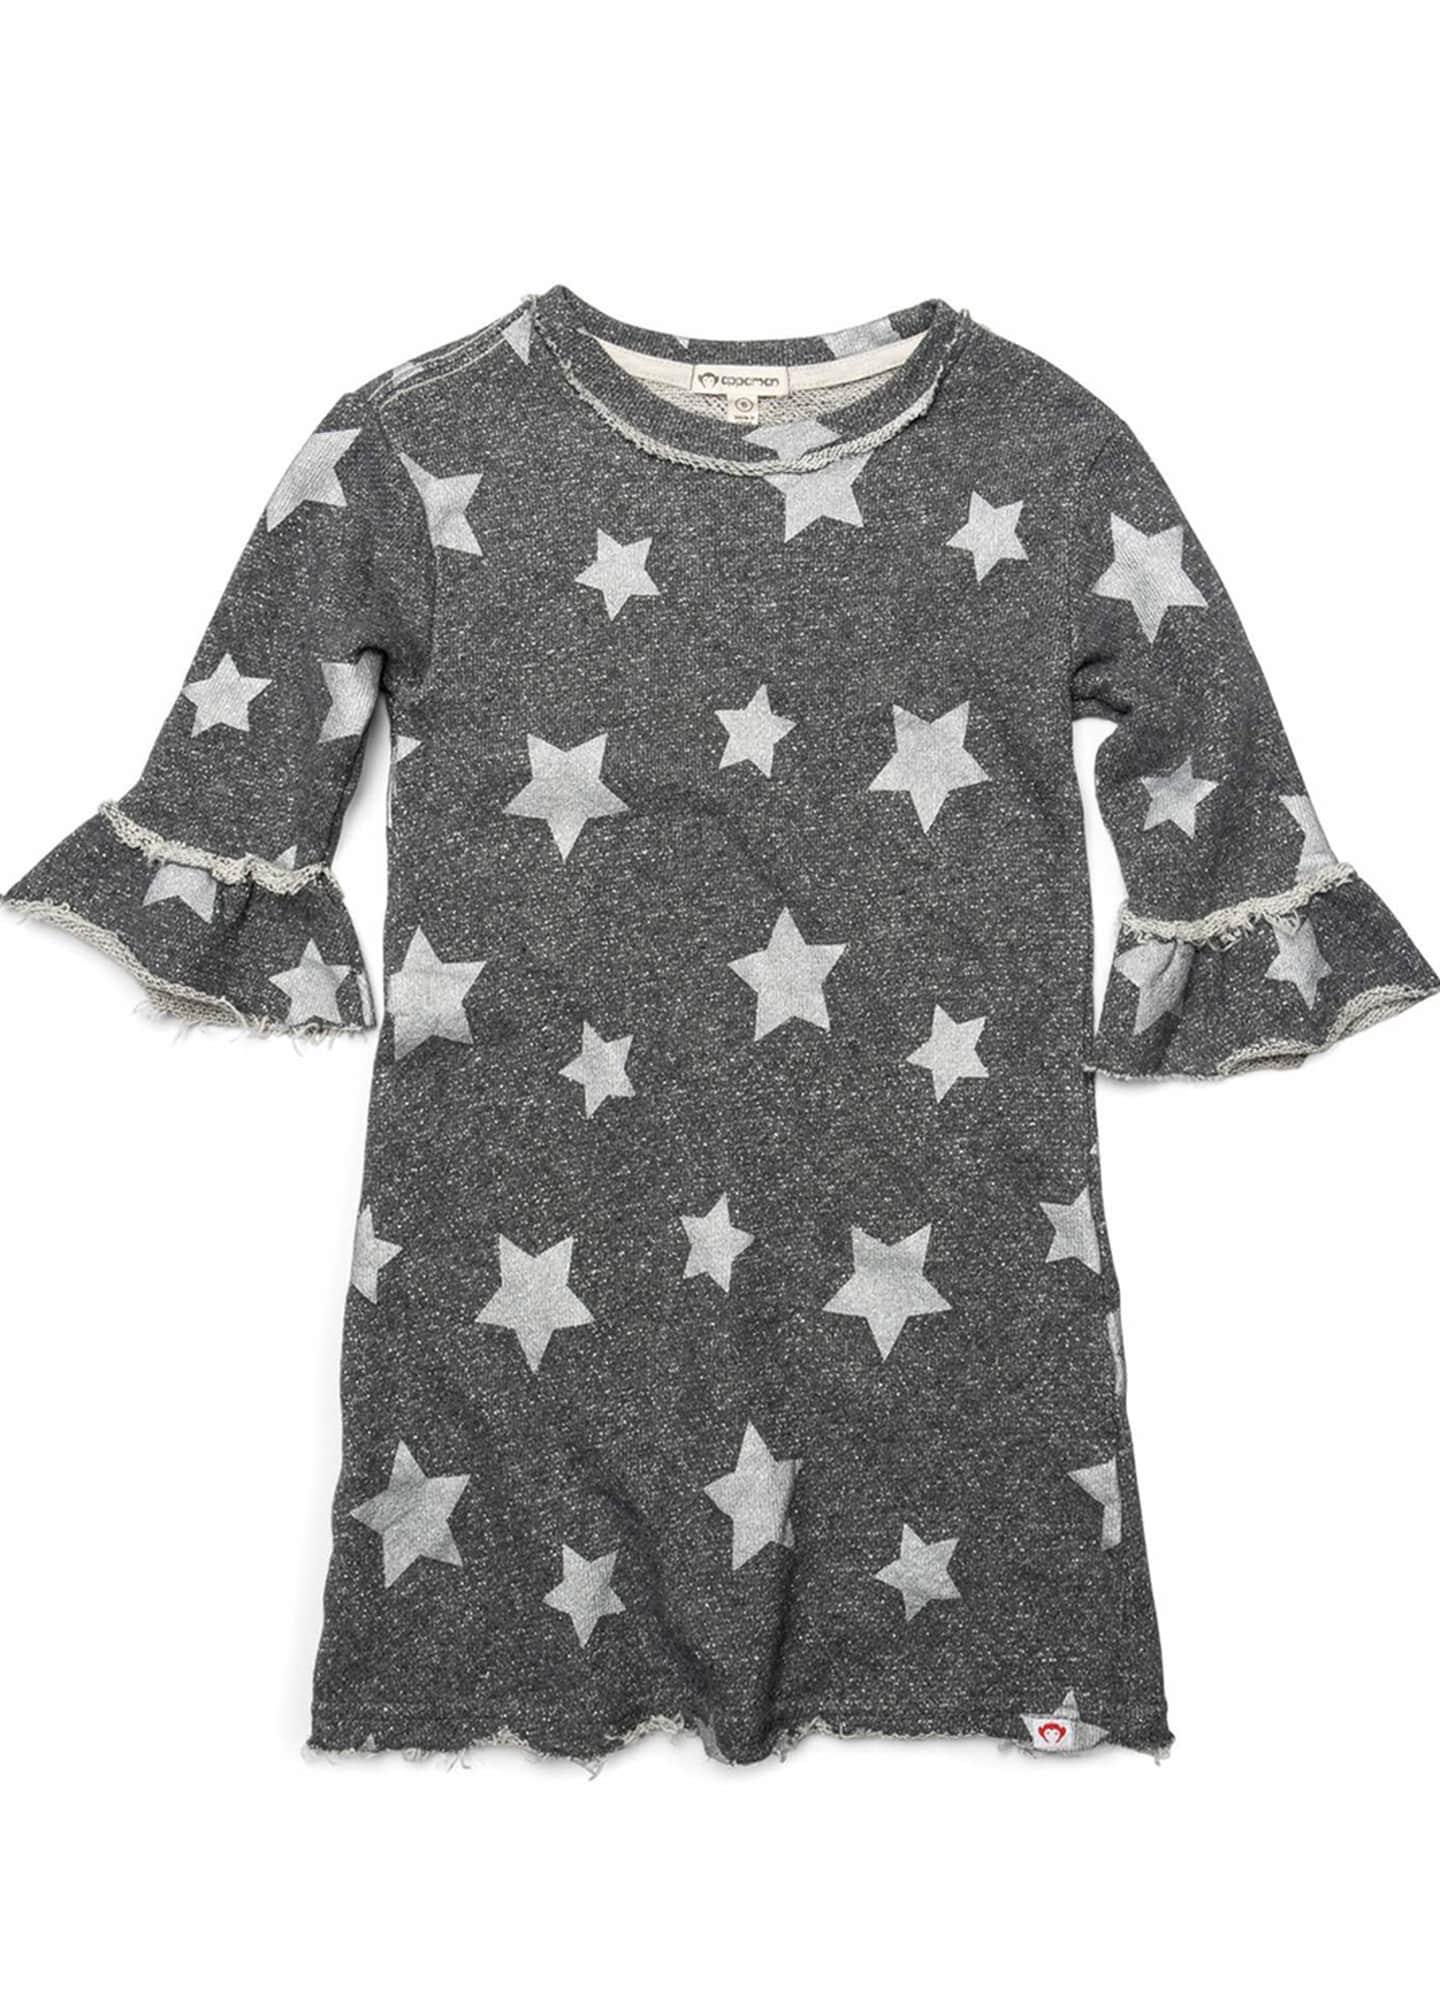 Appaman Kathleen Metallic Star Print Dress, Size 2-14